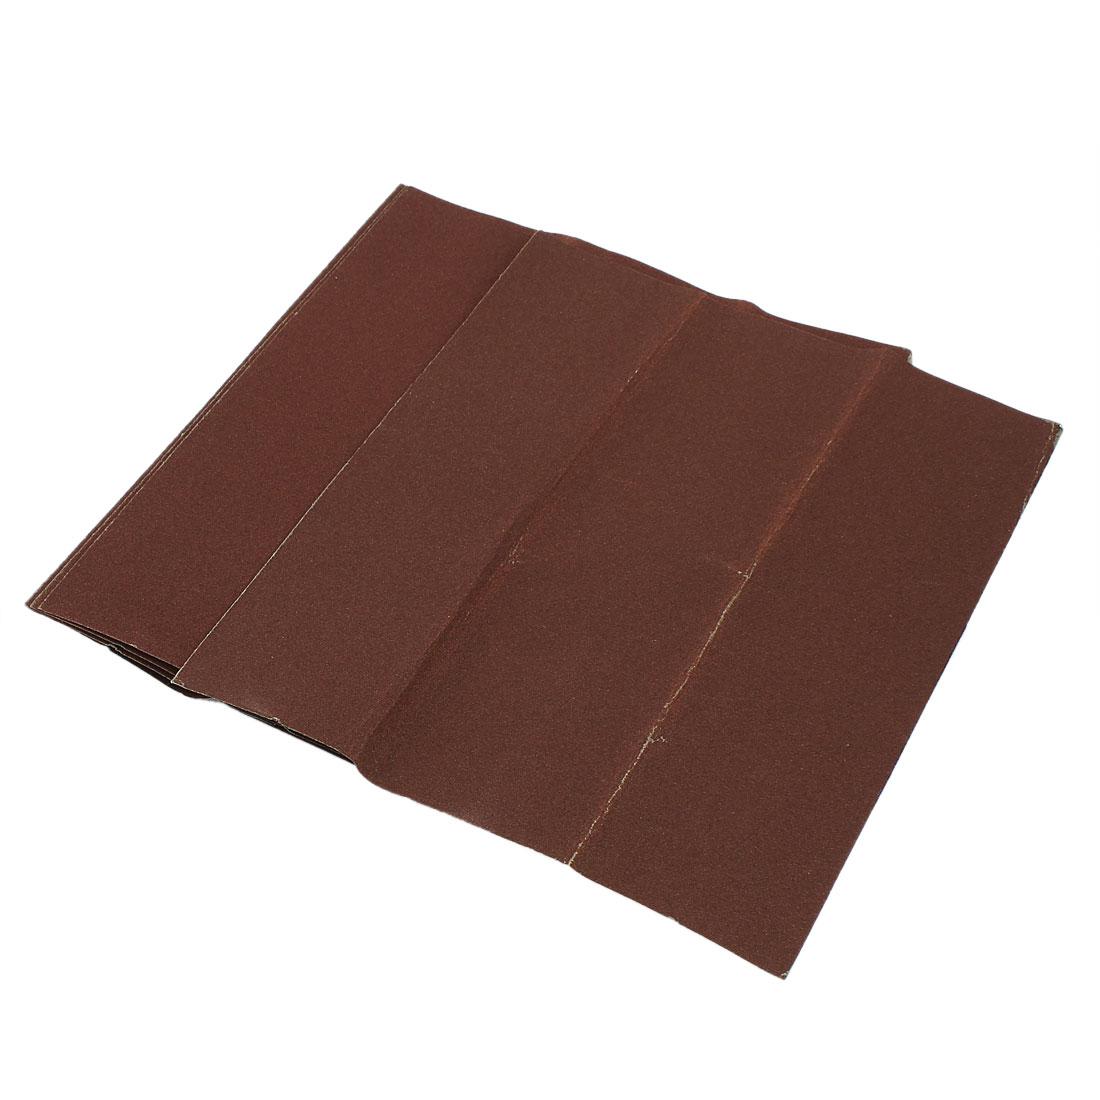 5 Pcs 22x27cm 240Grit Abrasive Paper Sanding Belt Sandpaper Sand Sheet